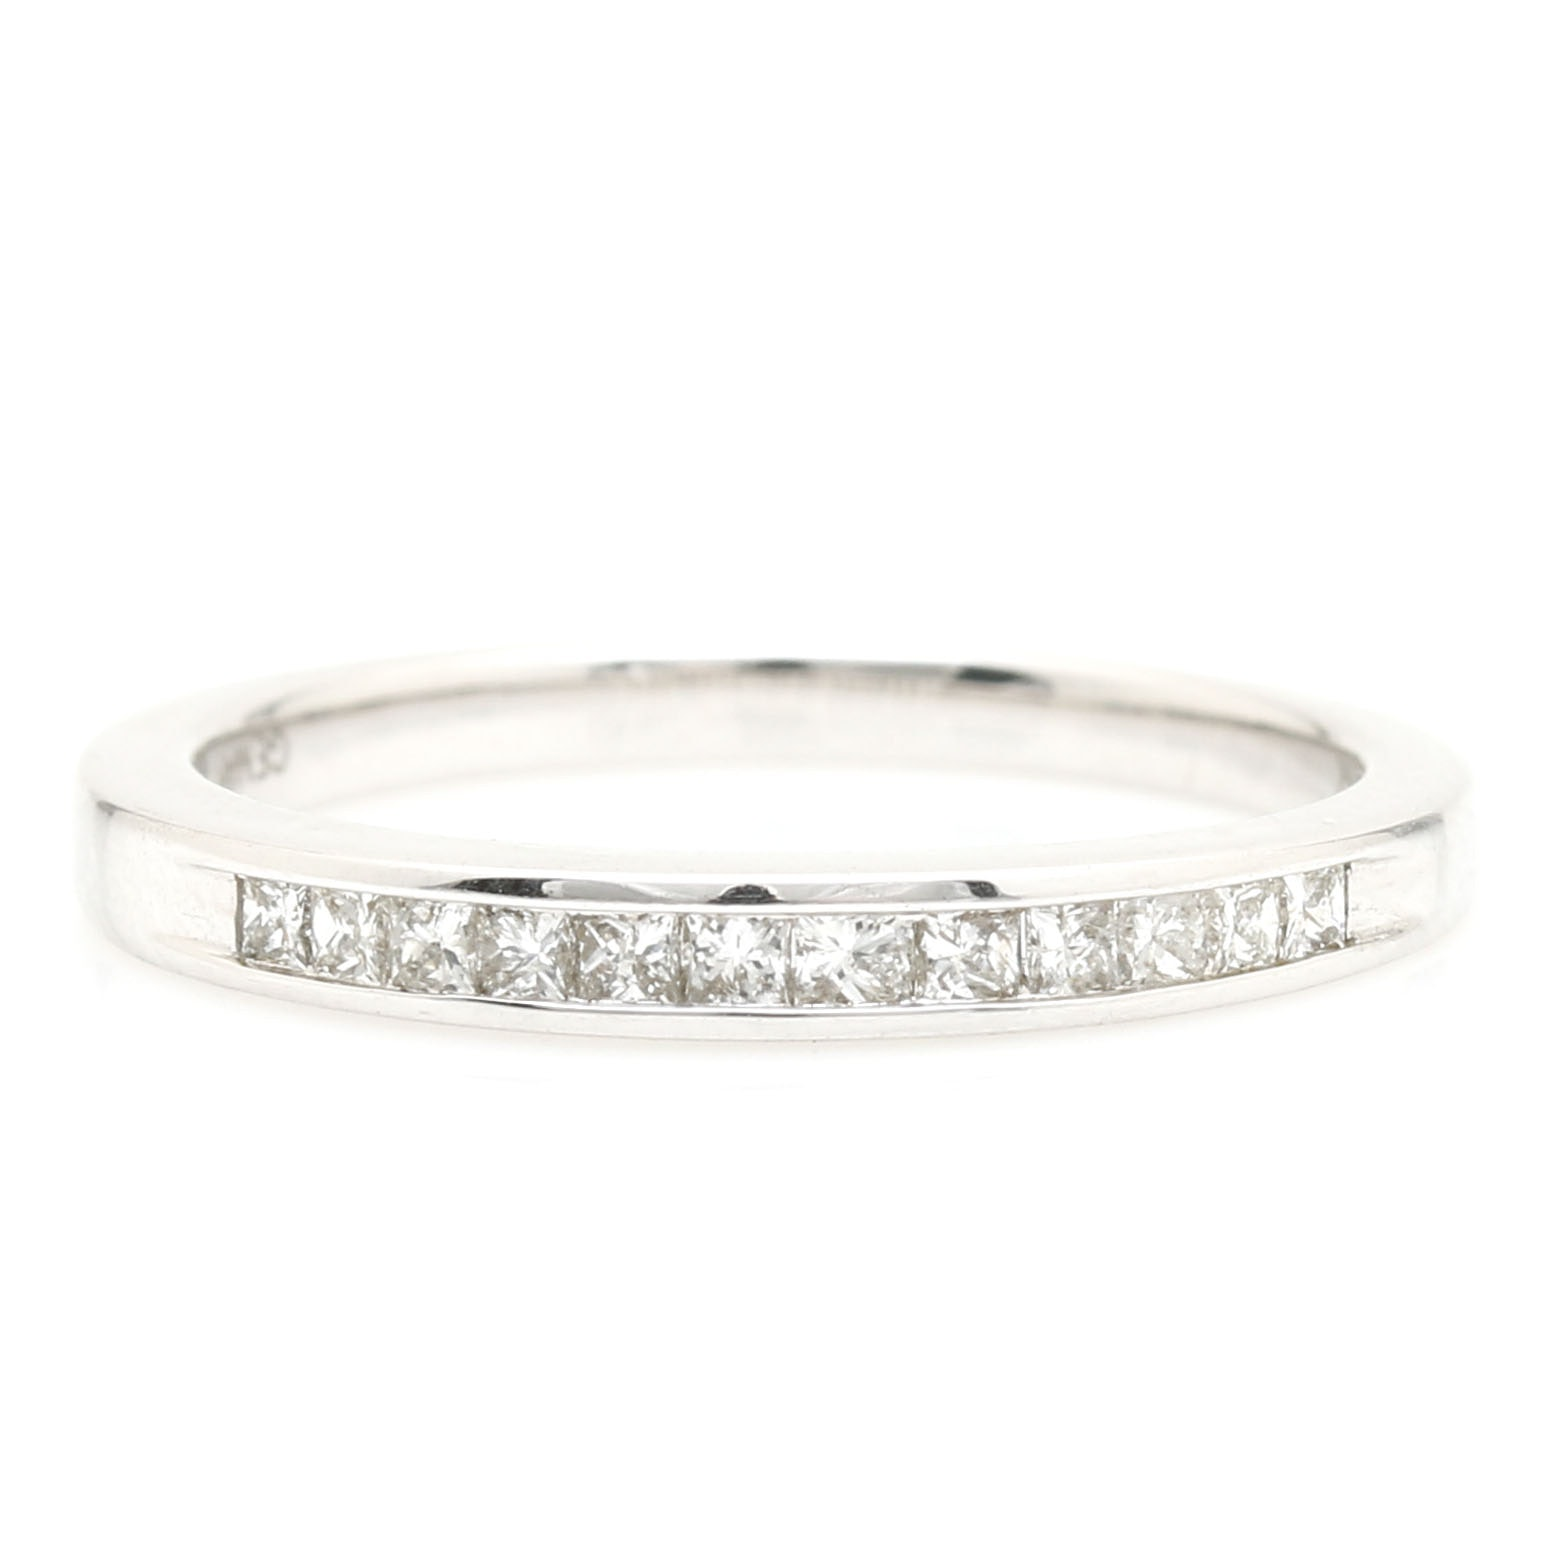 14K White Gold and Diamond Eternity Ring